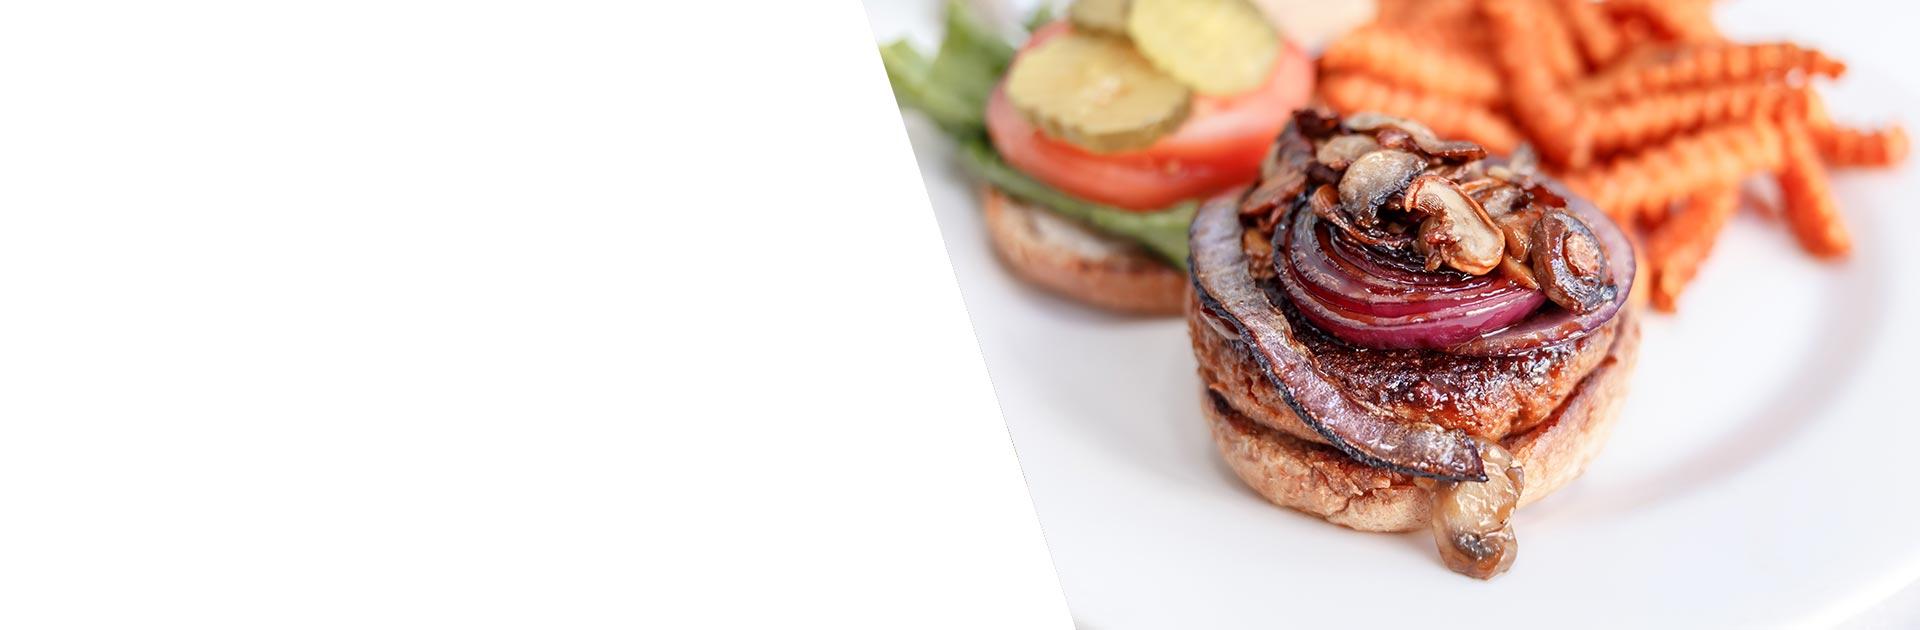 Ananda Fuara Vegetarian Restaurant San Francisco Beyond Burger